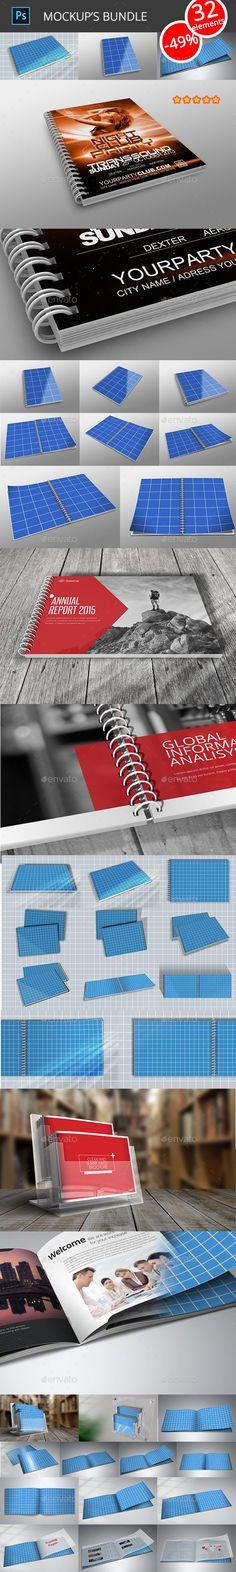 Publications MockUp's Bundle — Photoshop PSD #publication #book • Available here → https://graphicriver.net/item/publications-mockups-bundle/16395940?ref=pxcr